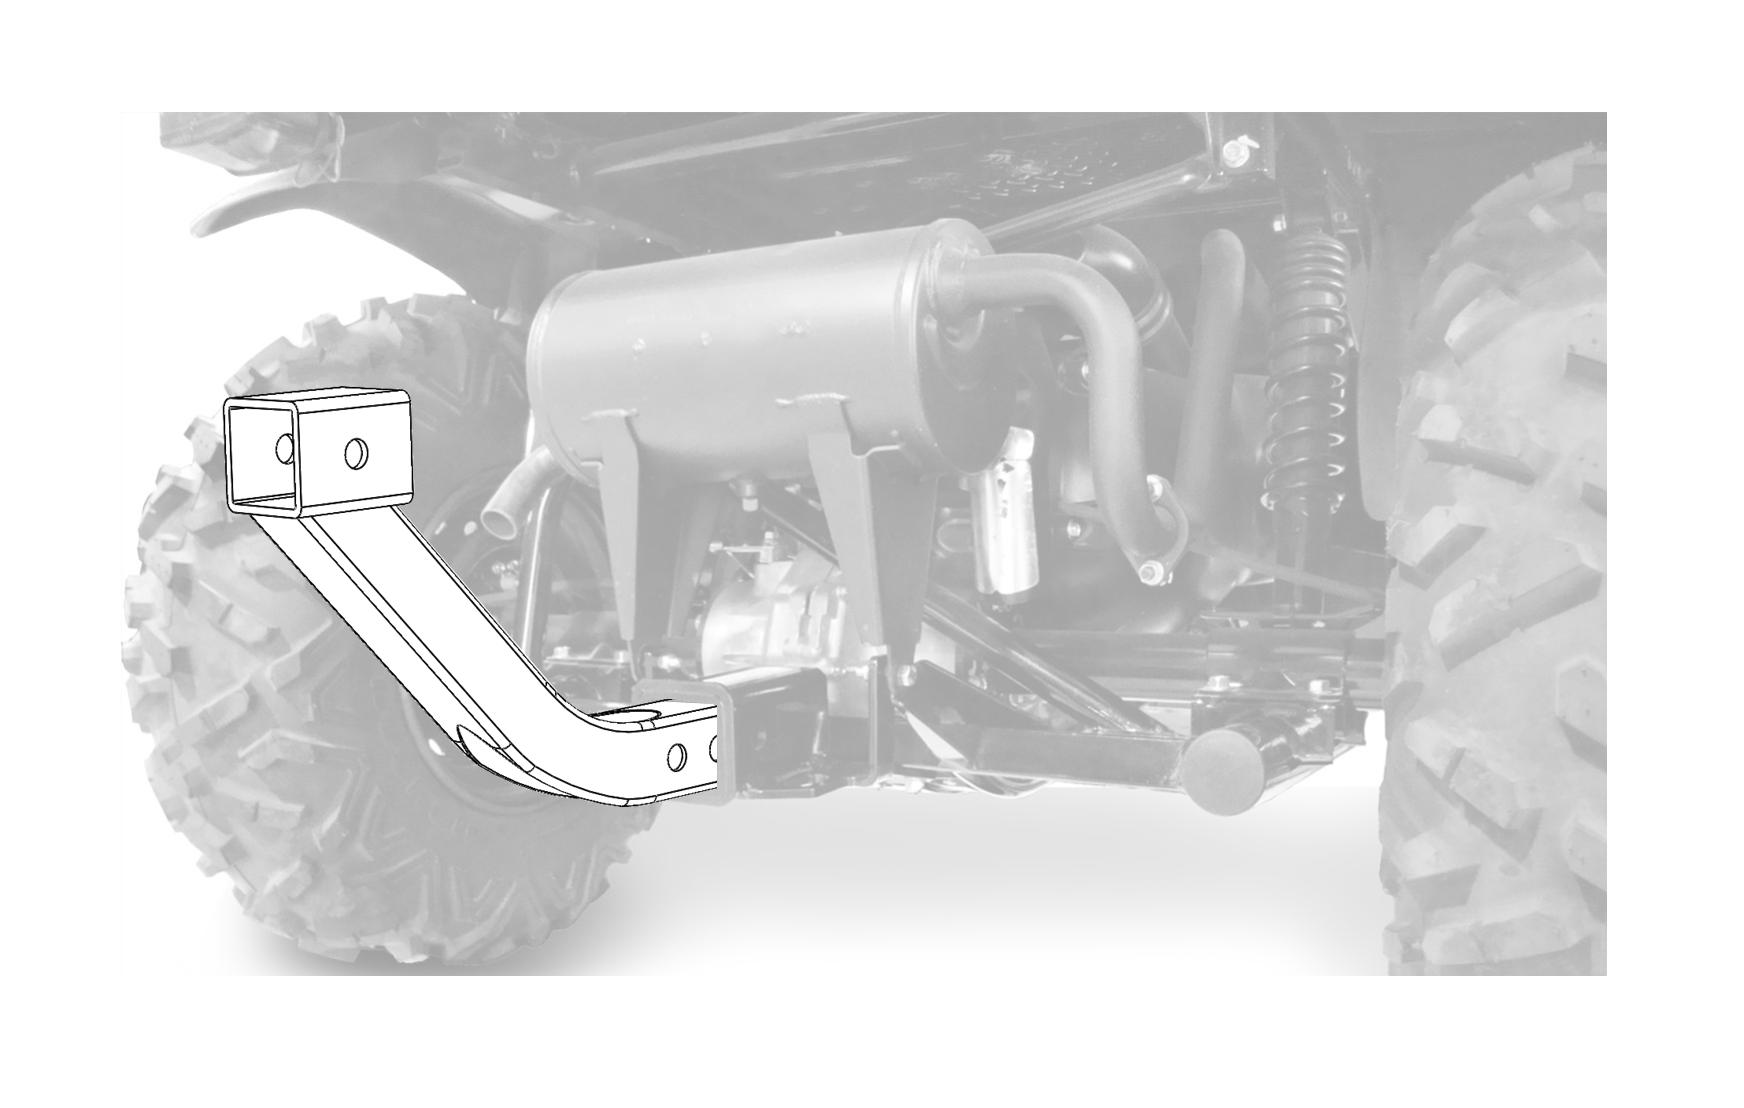 ATV//UTV Receiver Hitch Riser U-4044 Hornet Outdoors Steel Welded Powder Coated Made in USA